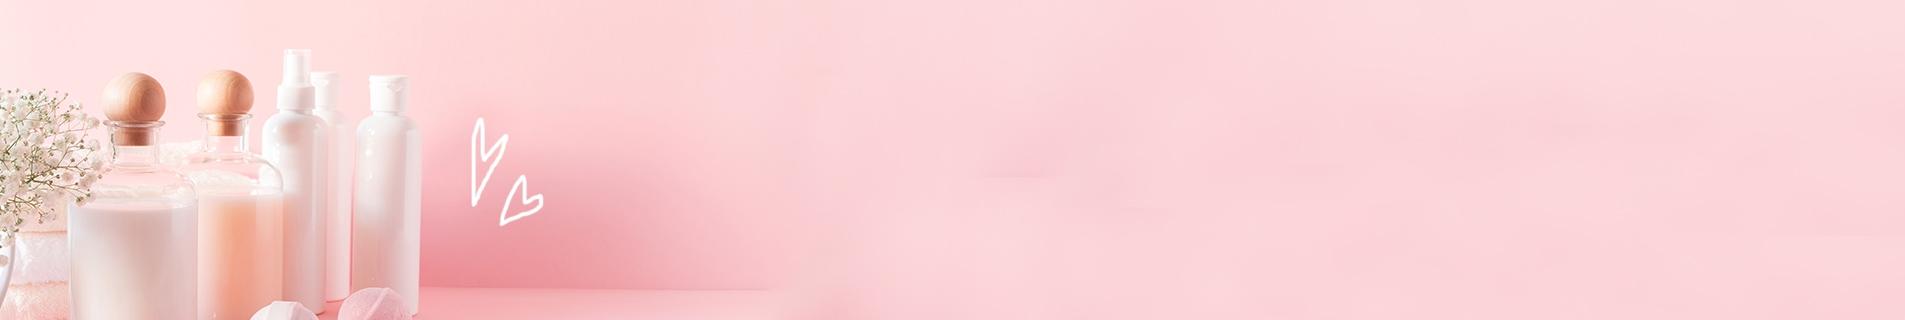 Promo maquillage | SAGA Cosmetics